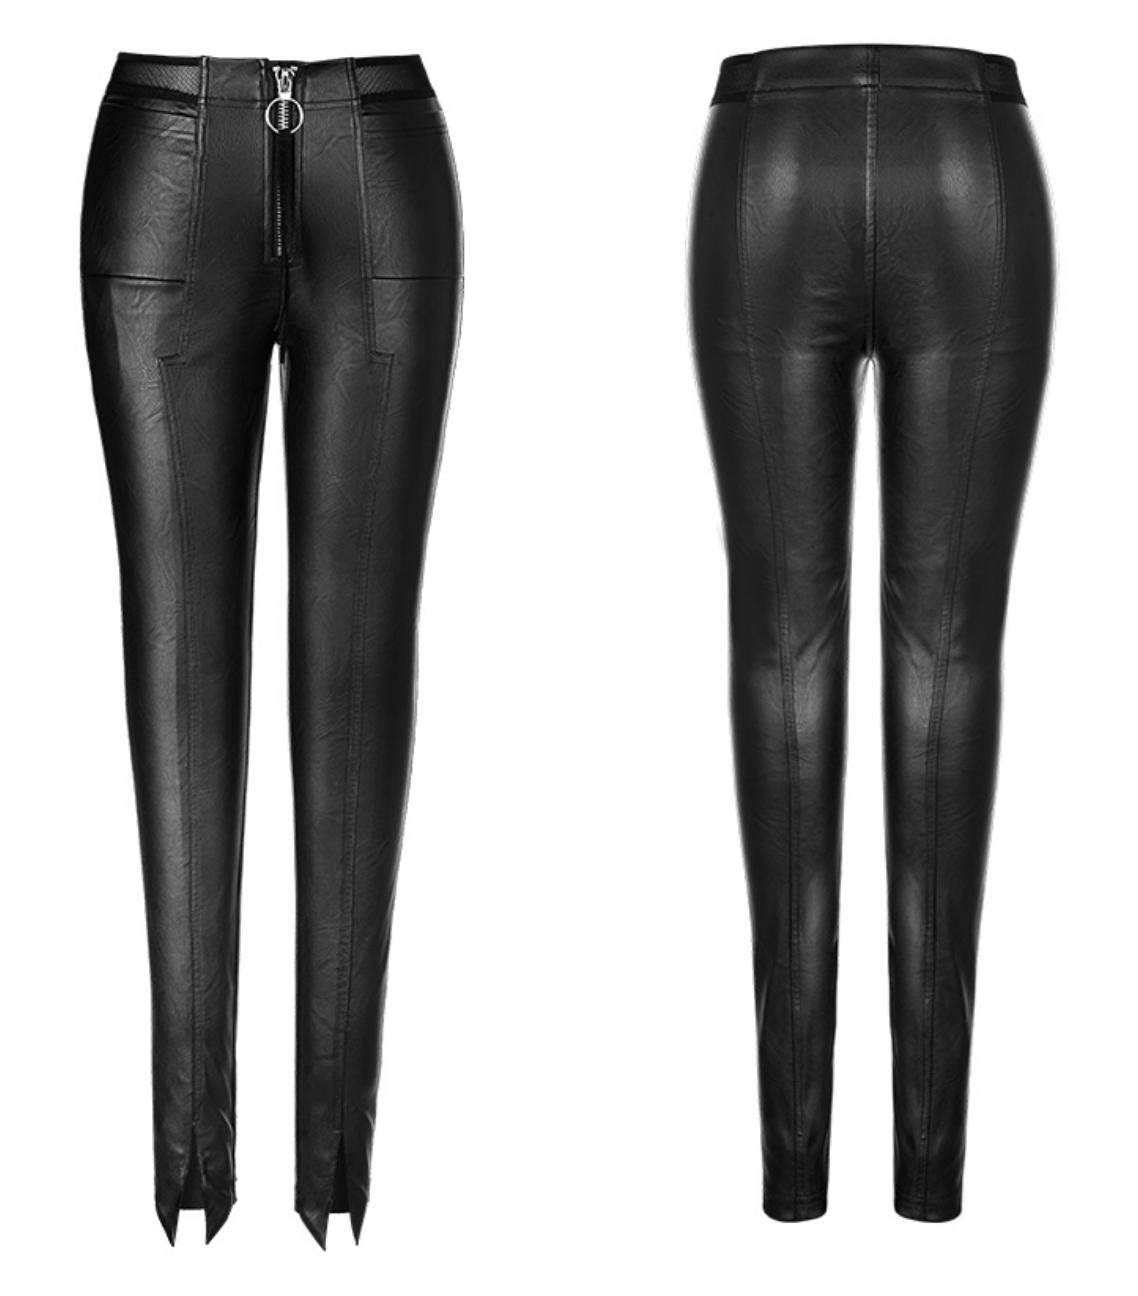 PNKR Skinny Leatherette Legging Pants